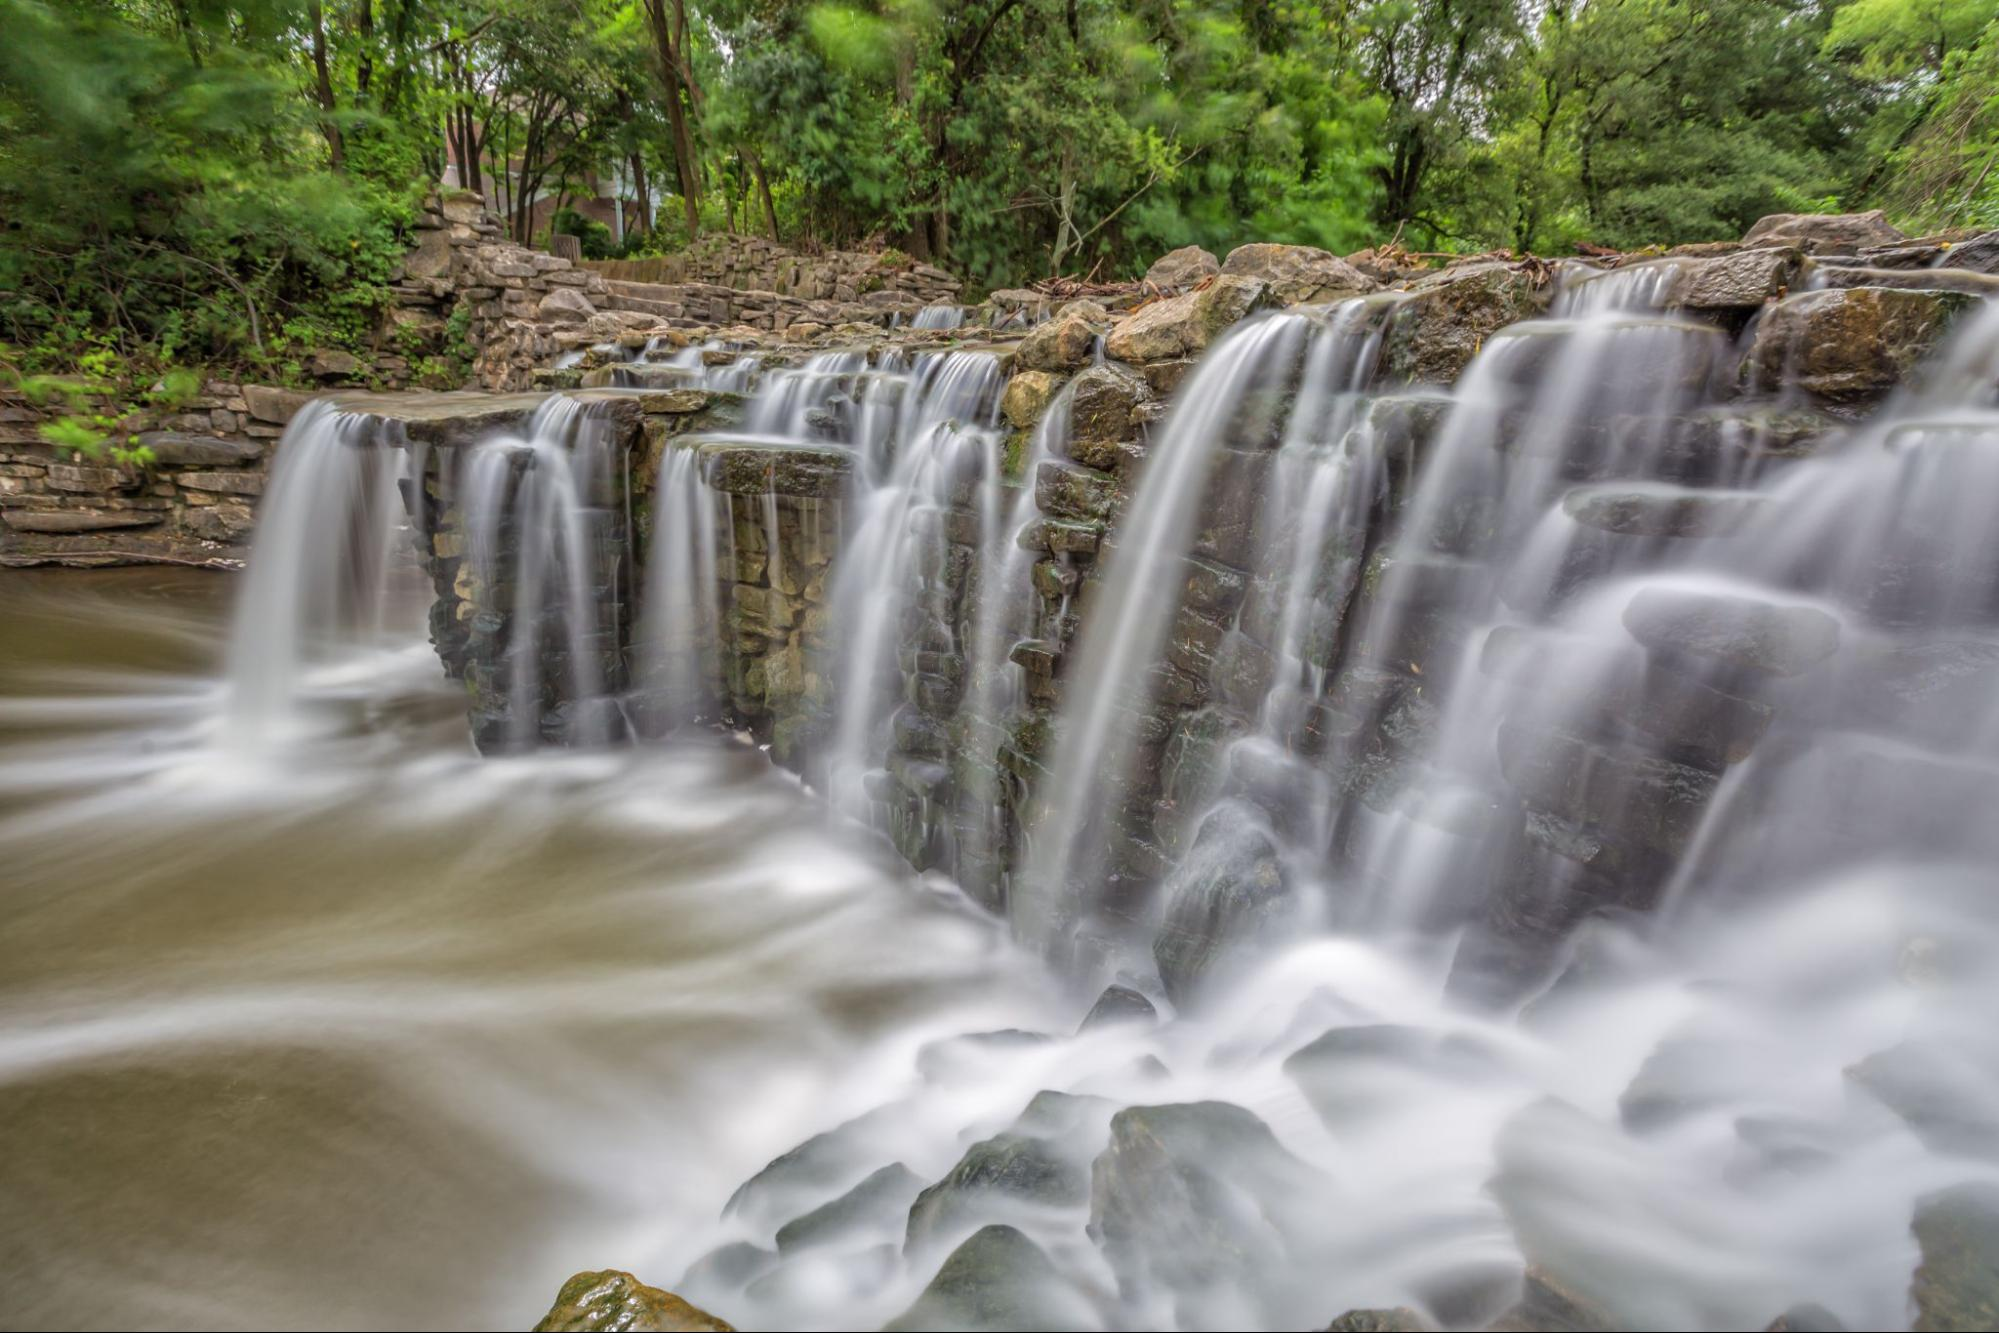 The Prairie Creek Waterfall in Richardson, Texas